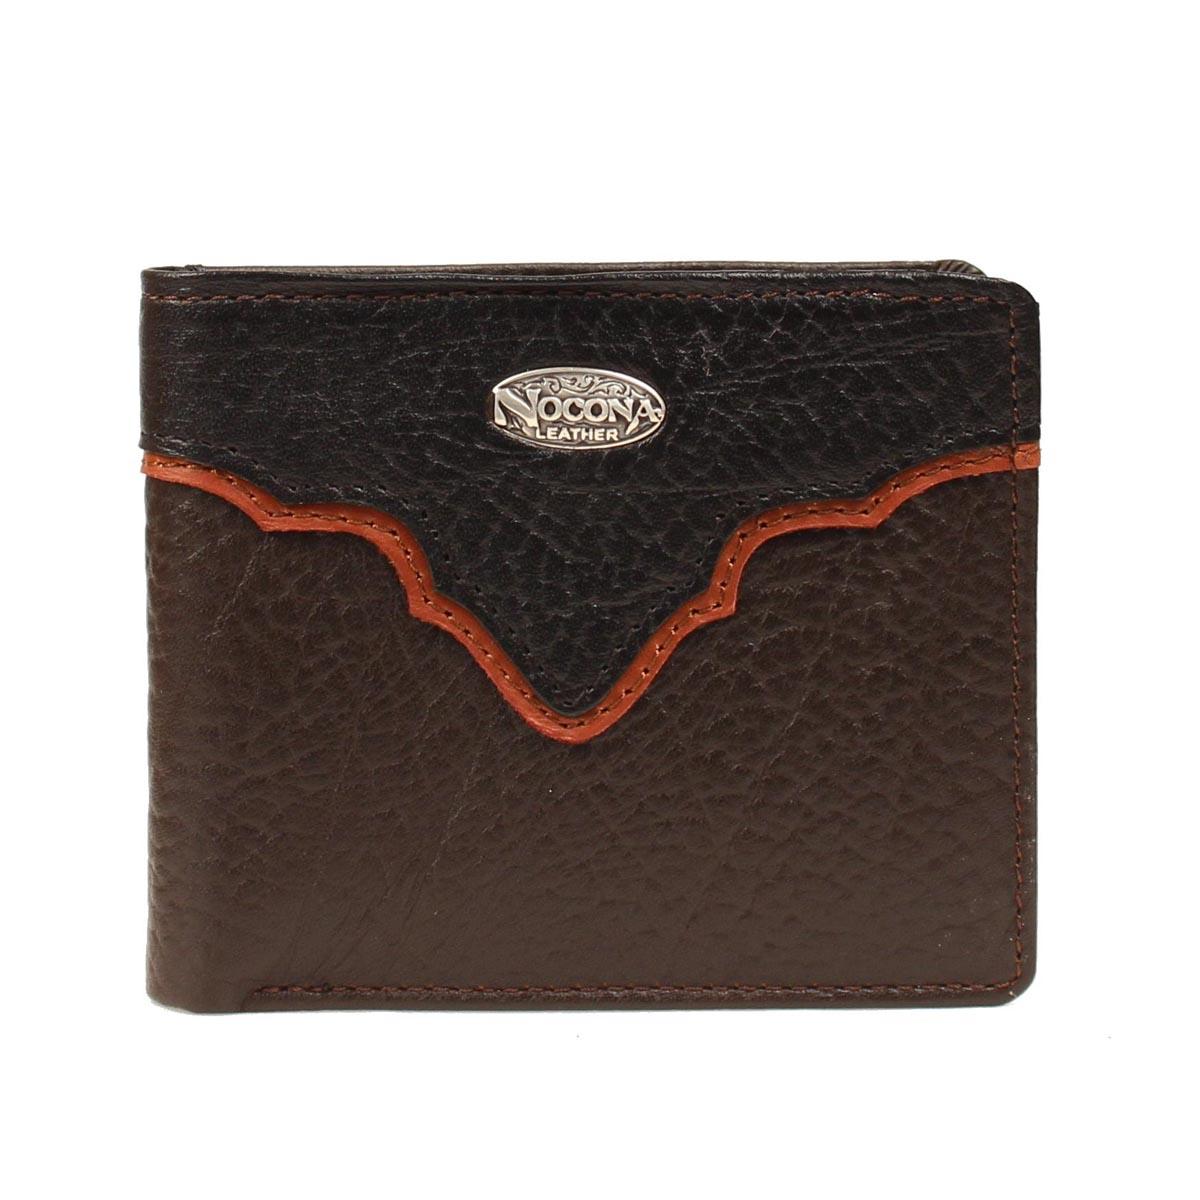 Nocona Bi-fold Western Overlay Concho Wallet